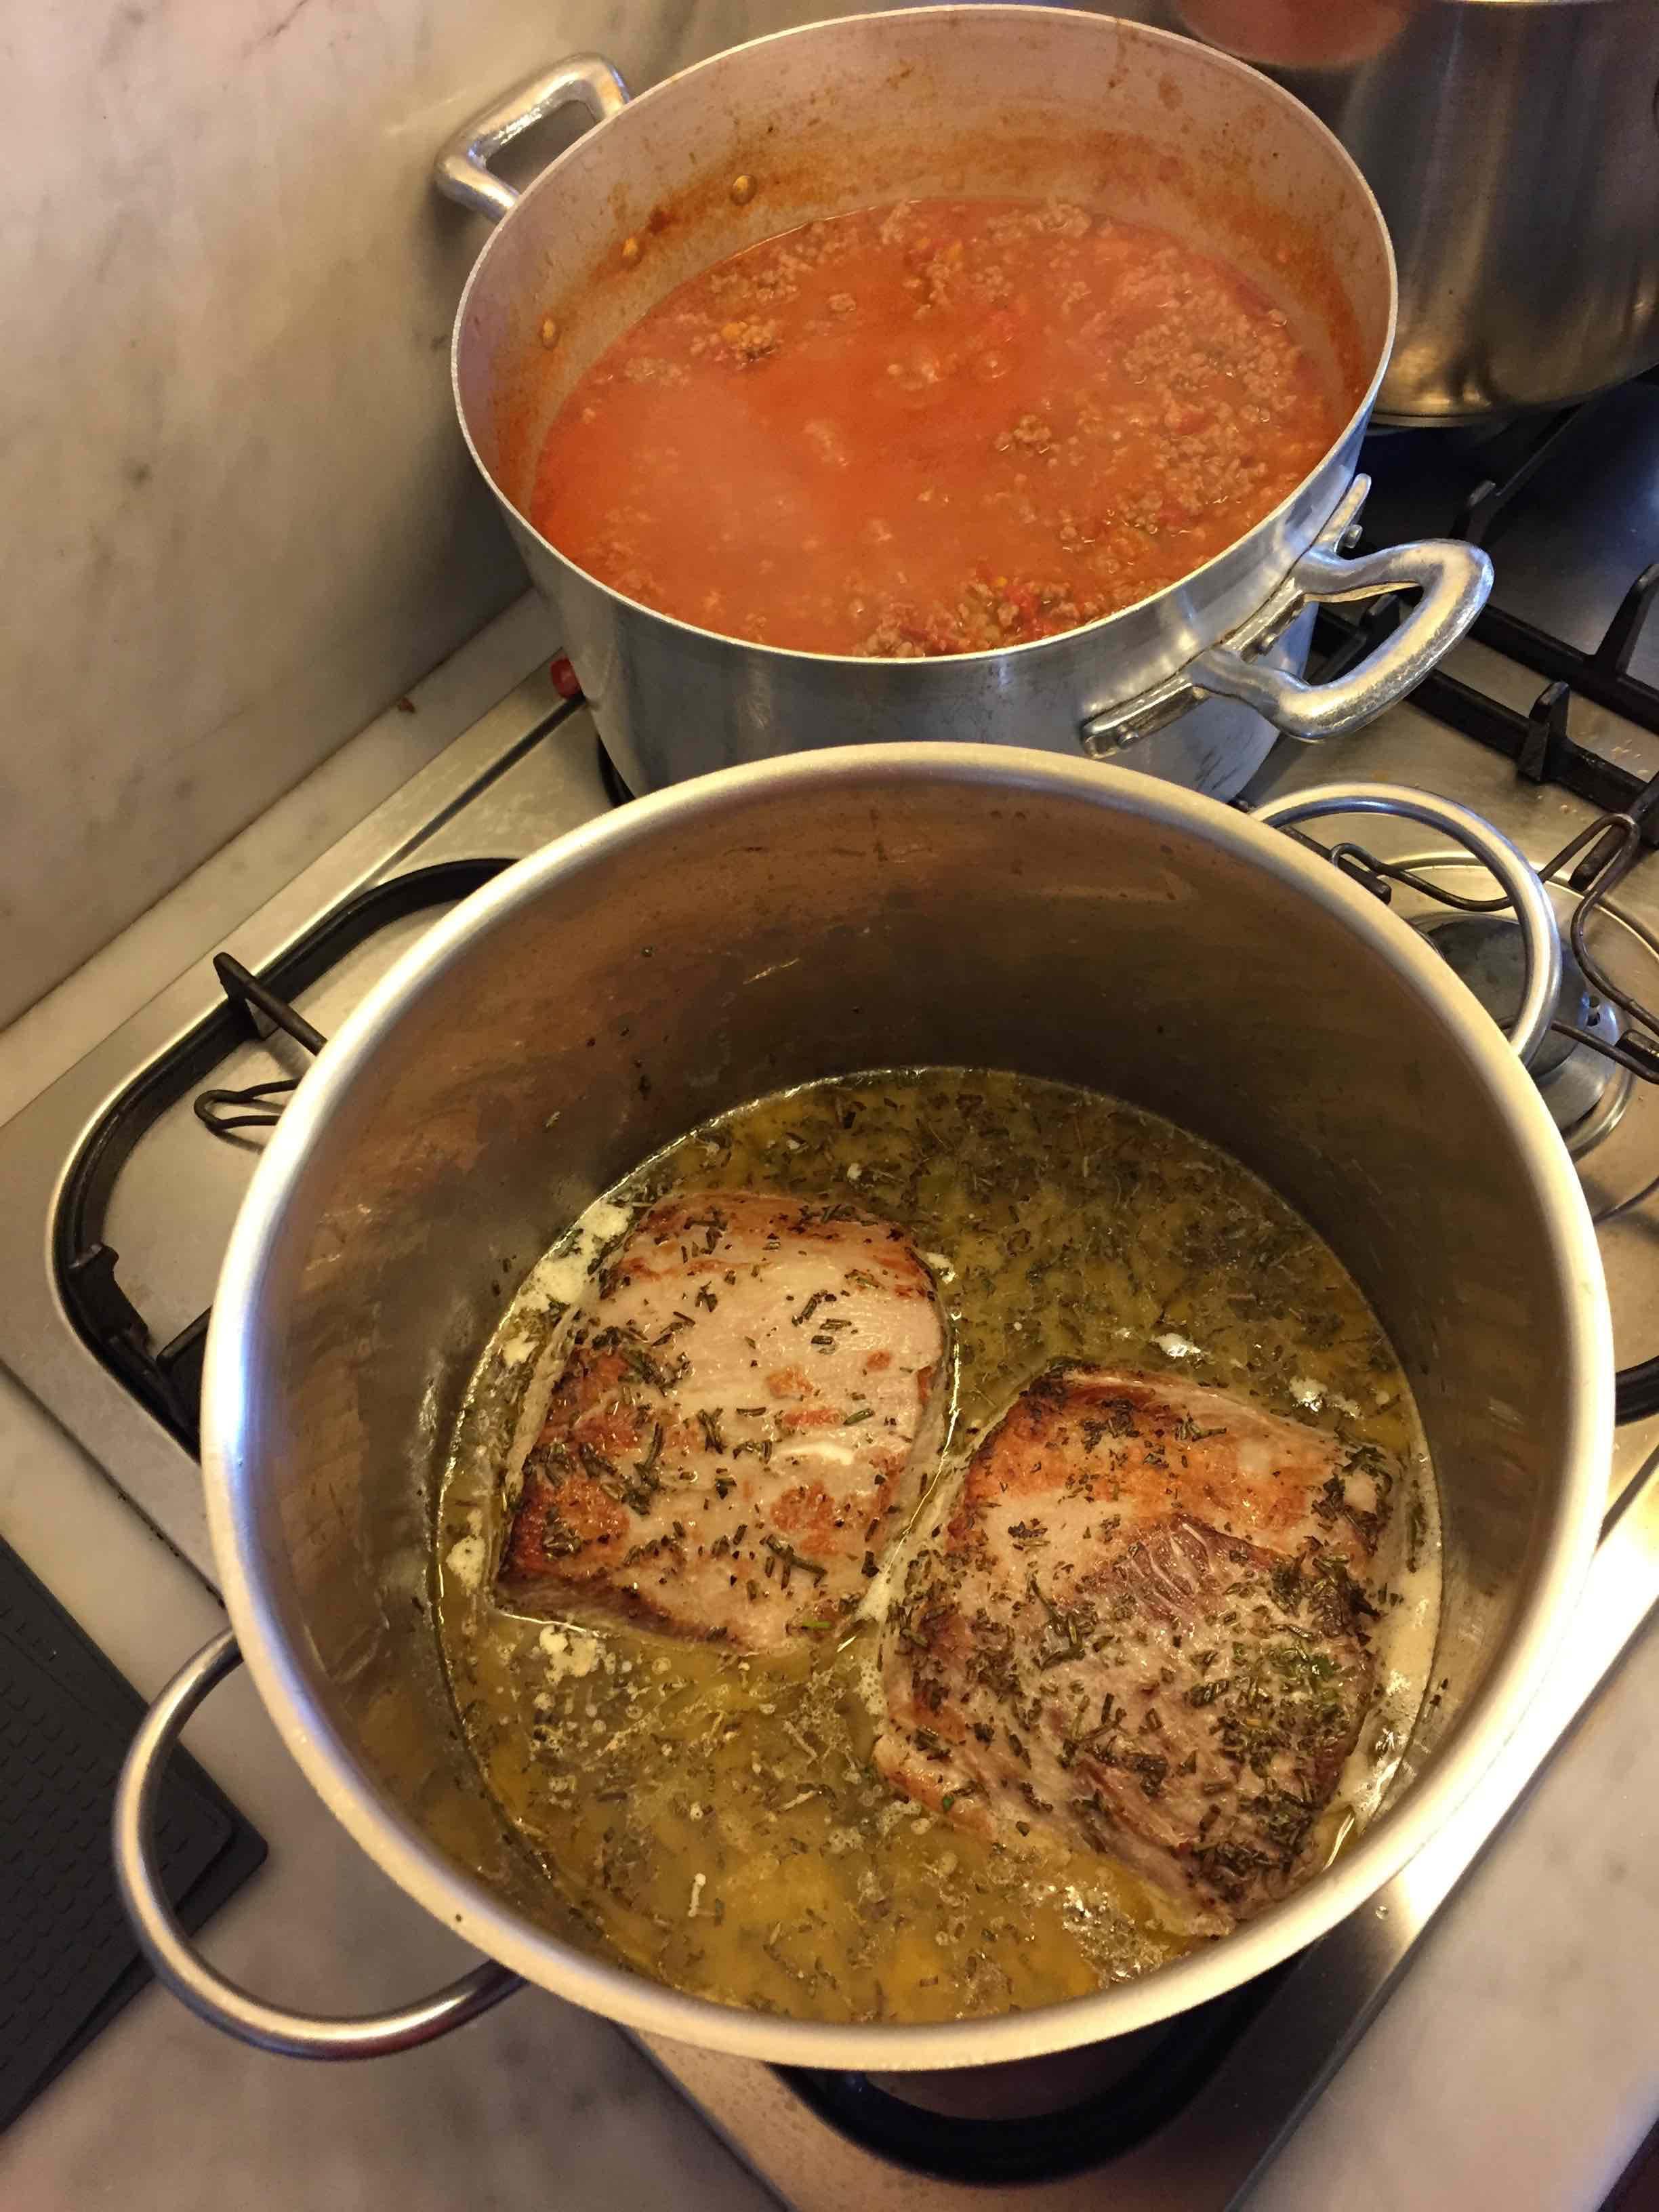 arista pork tuscan style cooking class